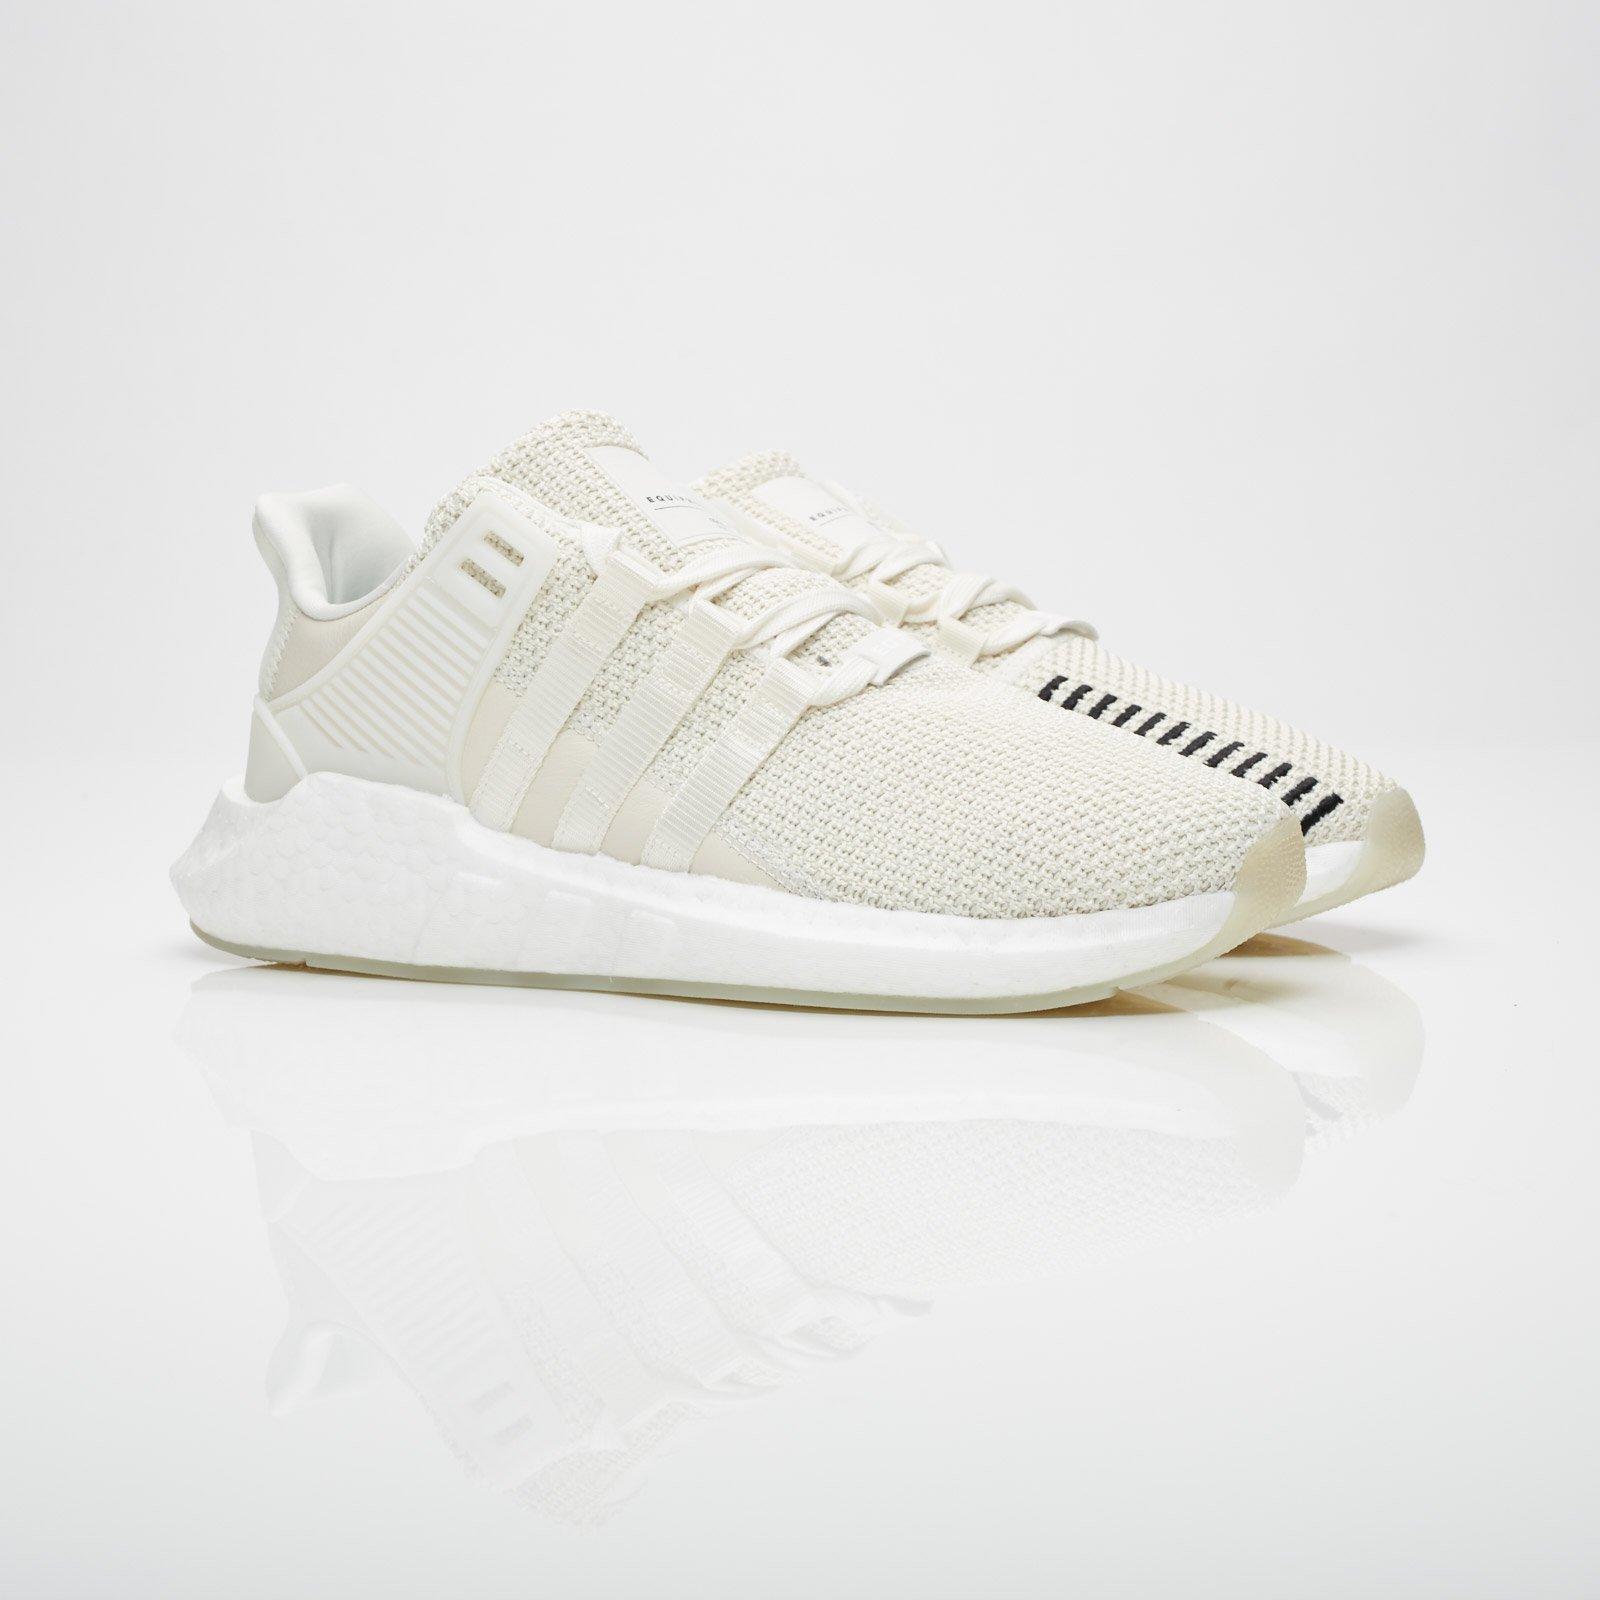 Adidas EQT Support 93 / 17 bz0586 sneakersnstuff Sneakers